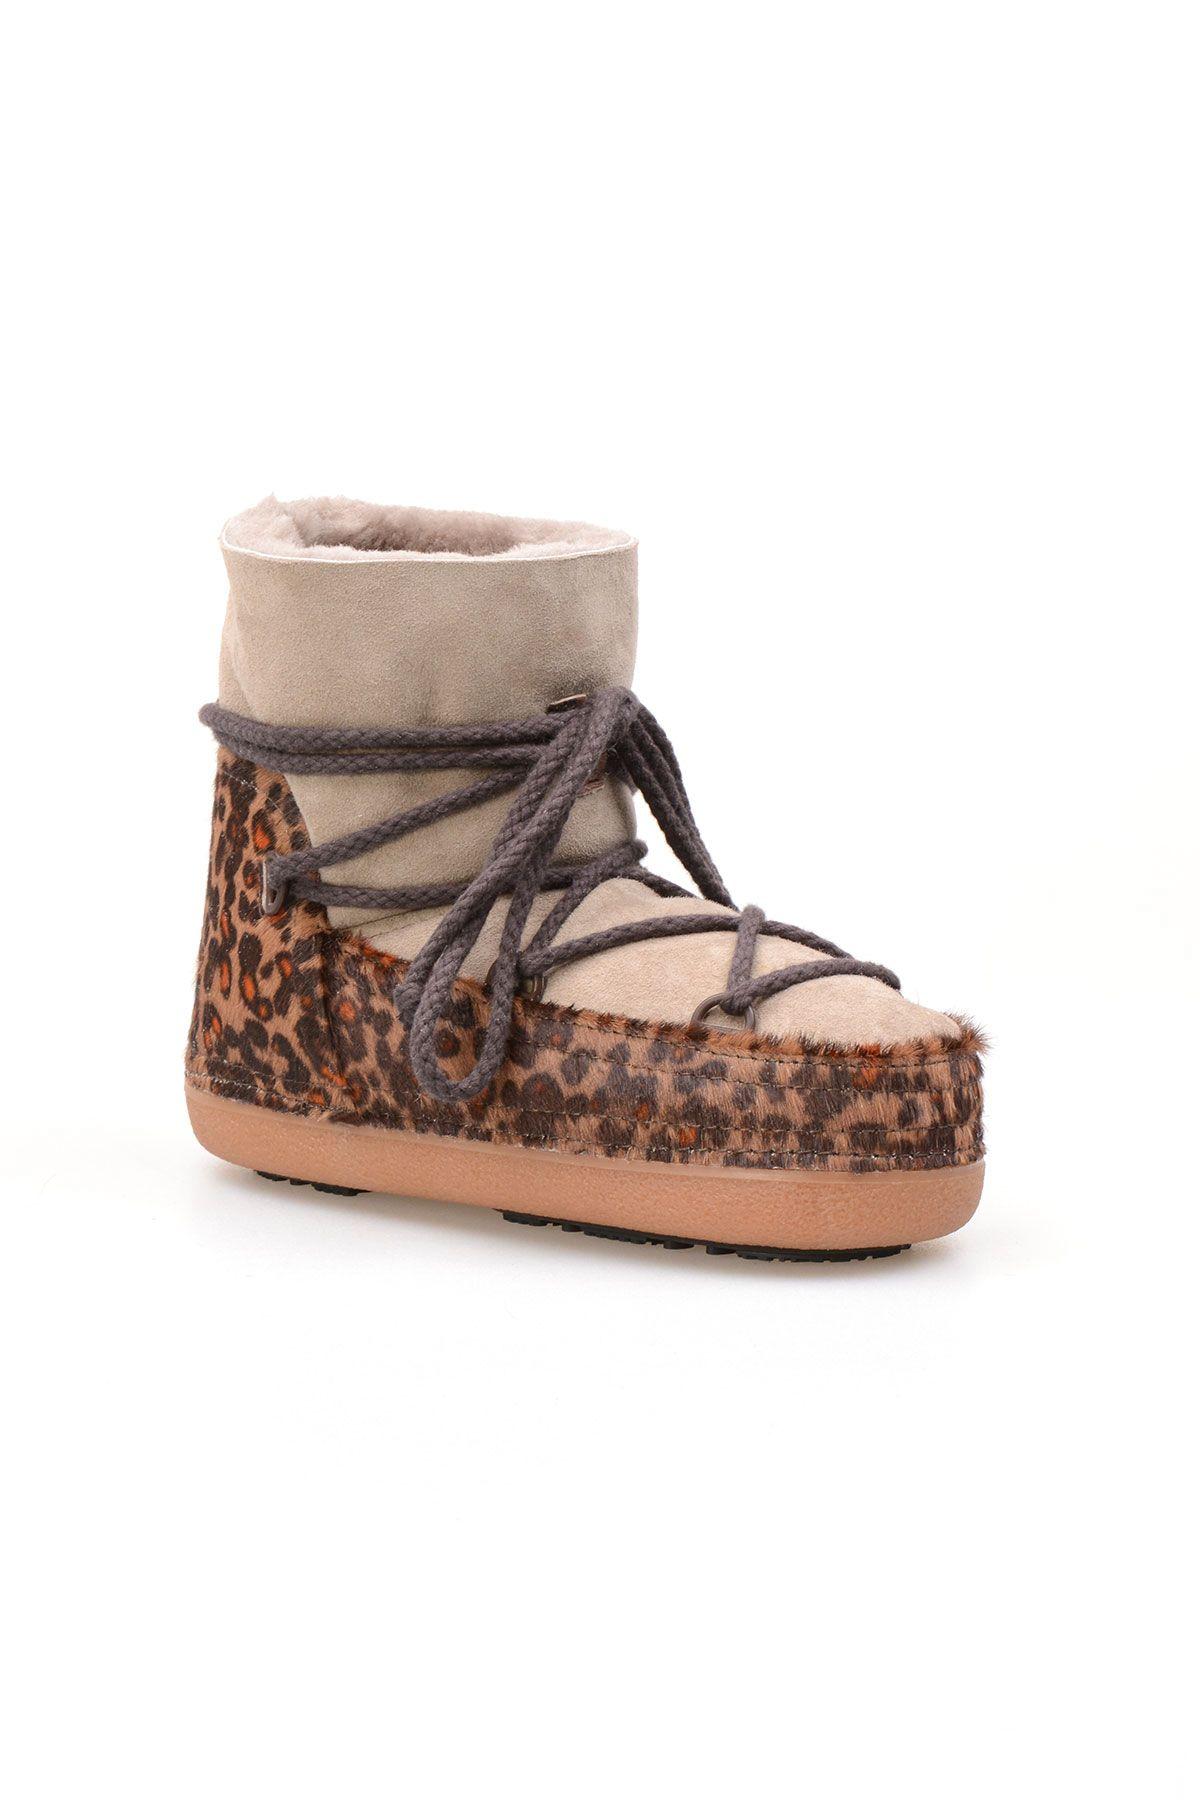 Cool Moon Genuine Sheepskin Women Snow Boots 251115 Gray